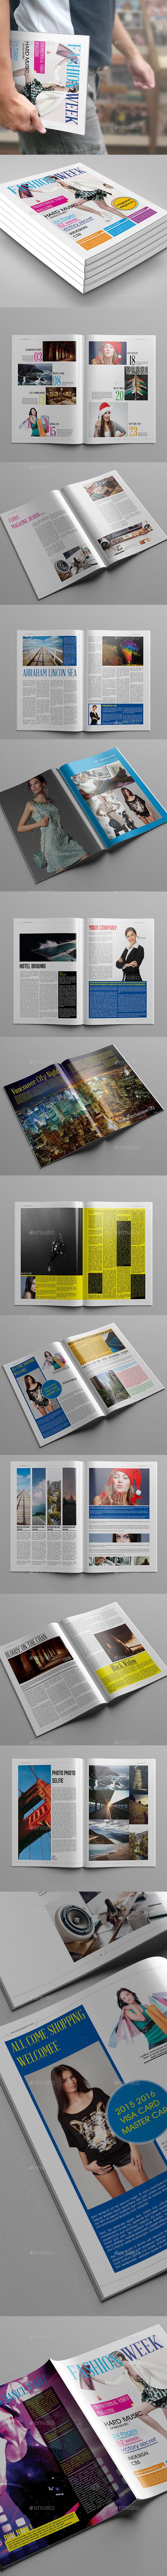 Fashion Week Magazine Template - Magazines Print Templates